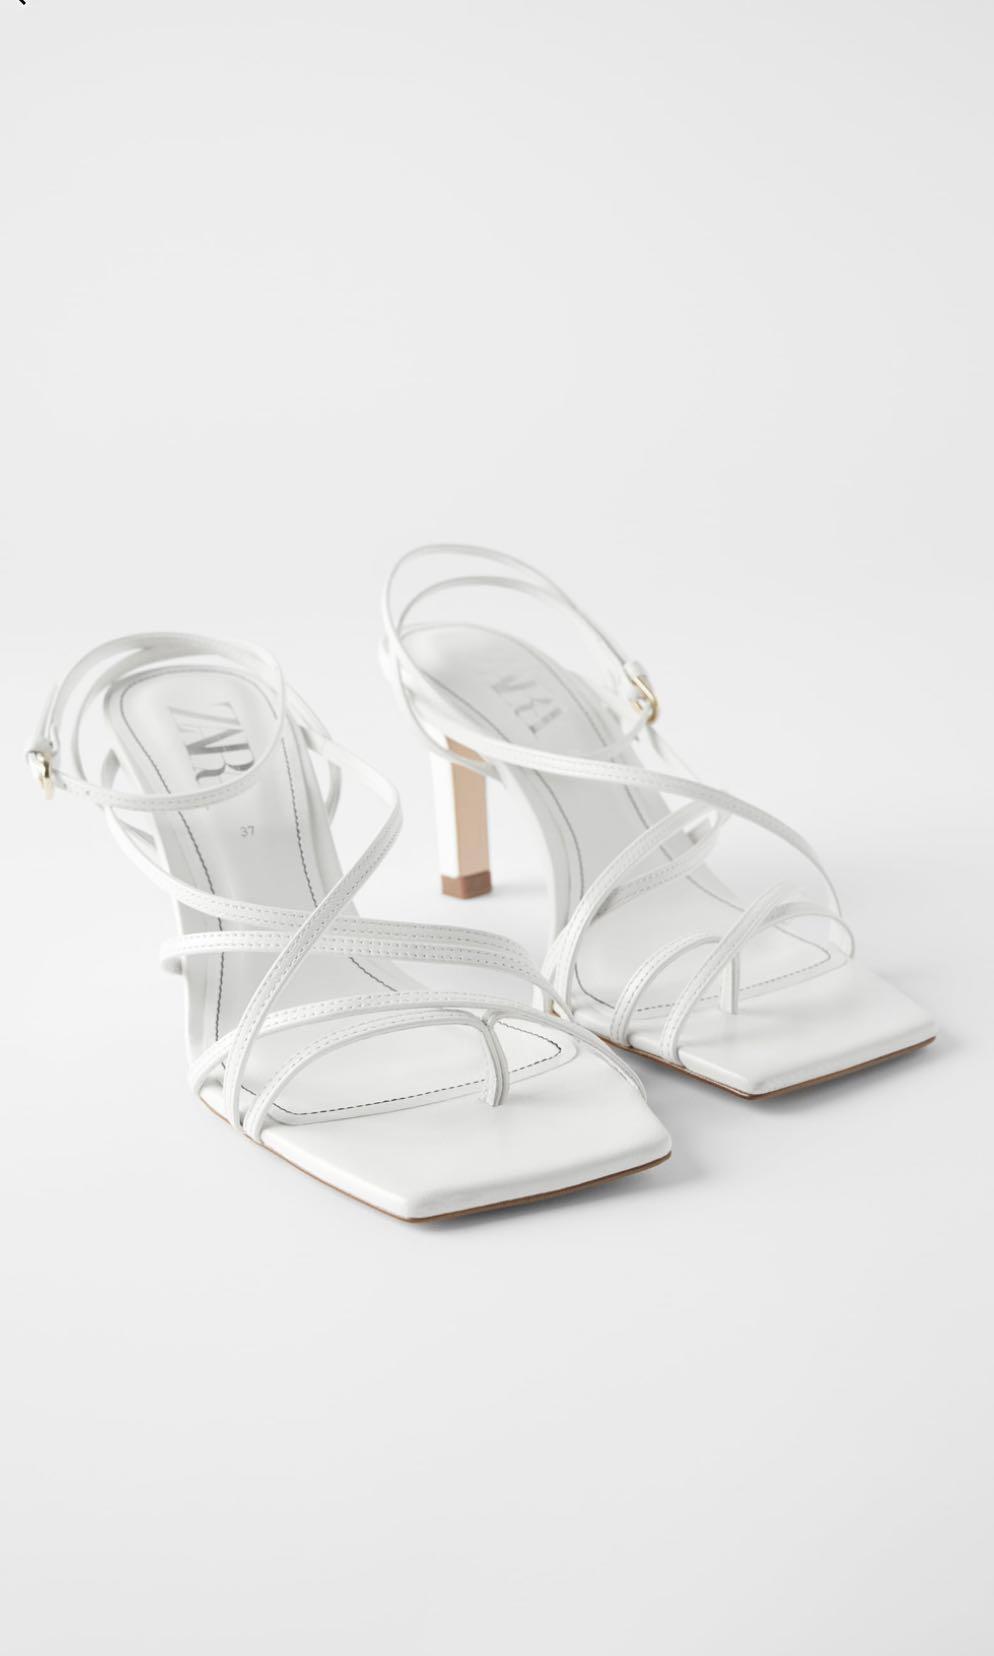 Zara white strappy open toed sandals